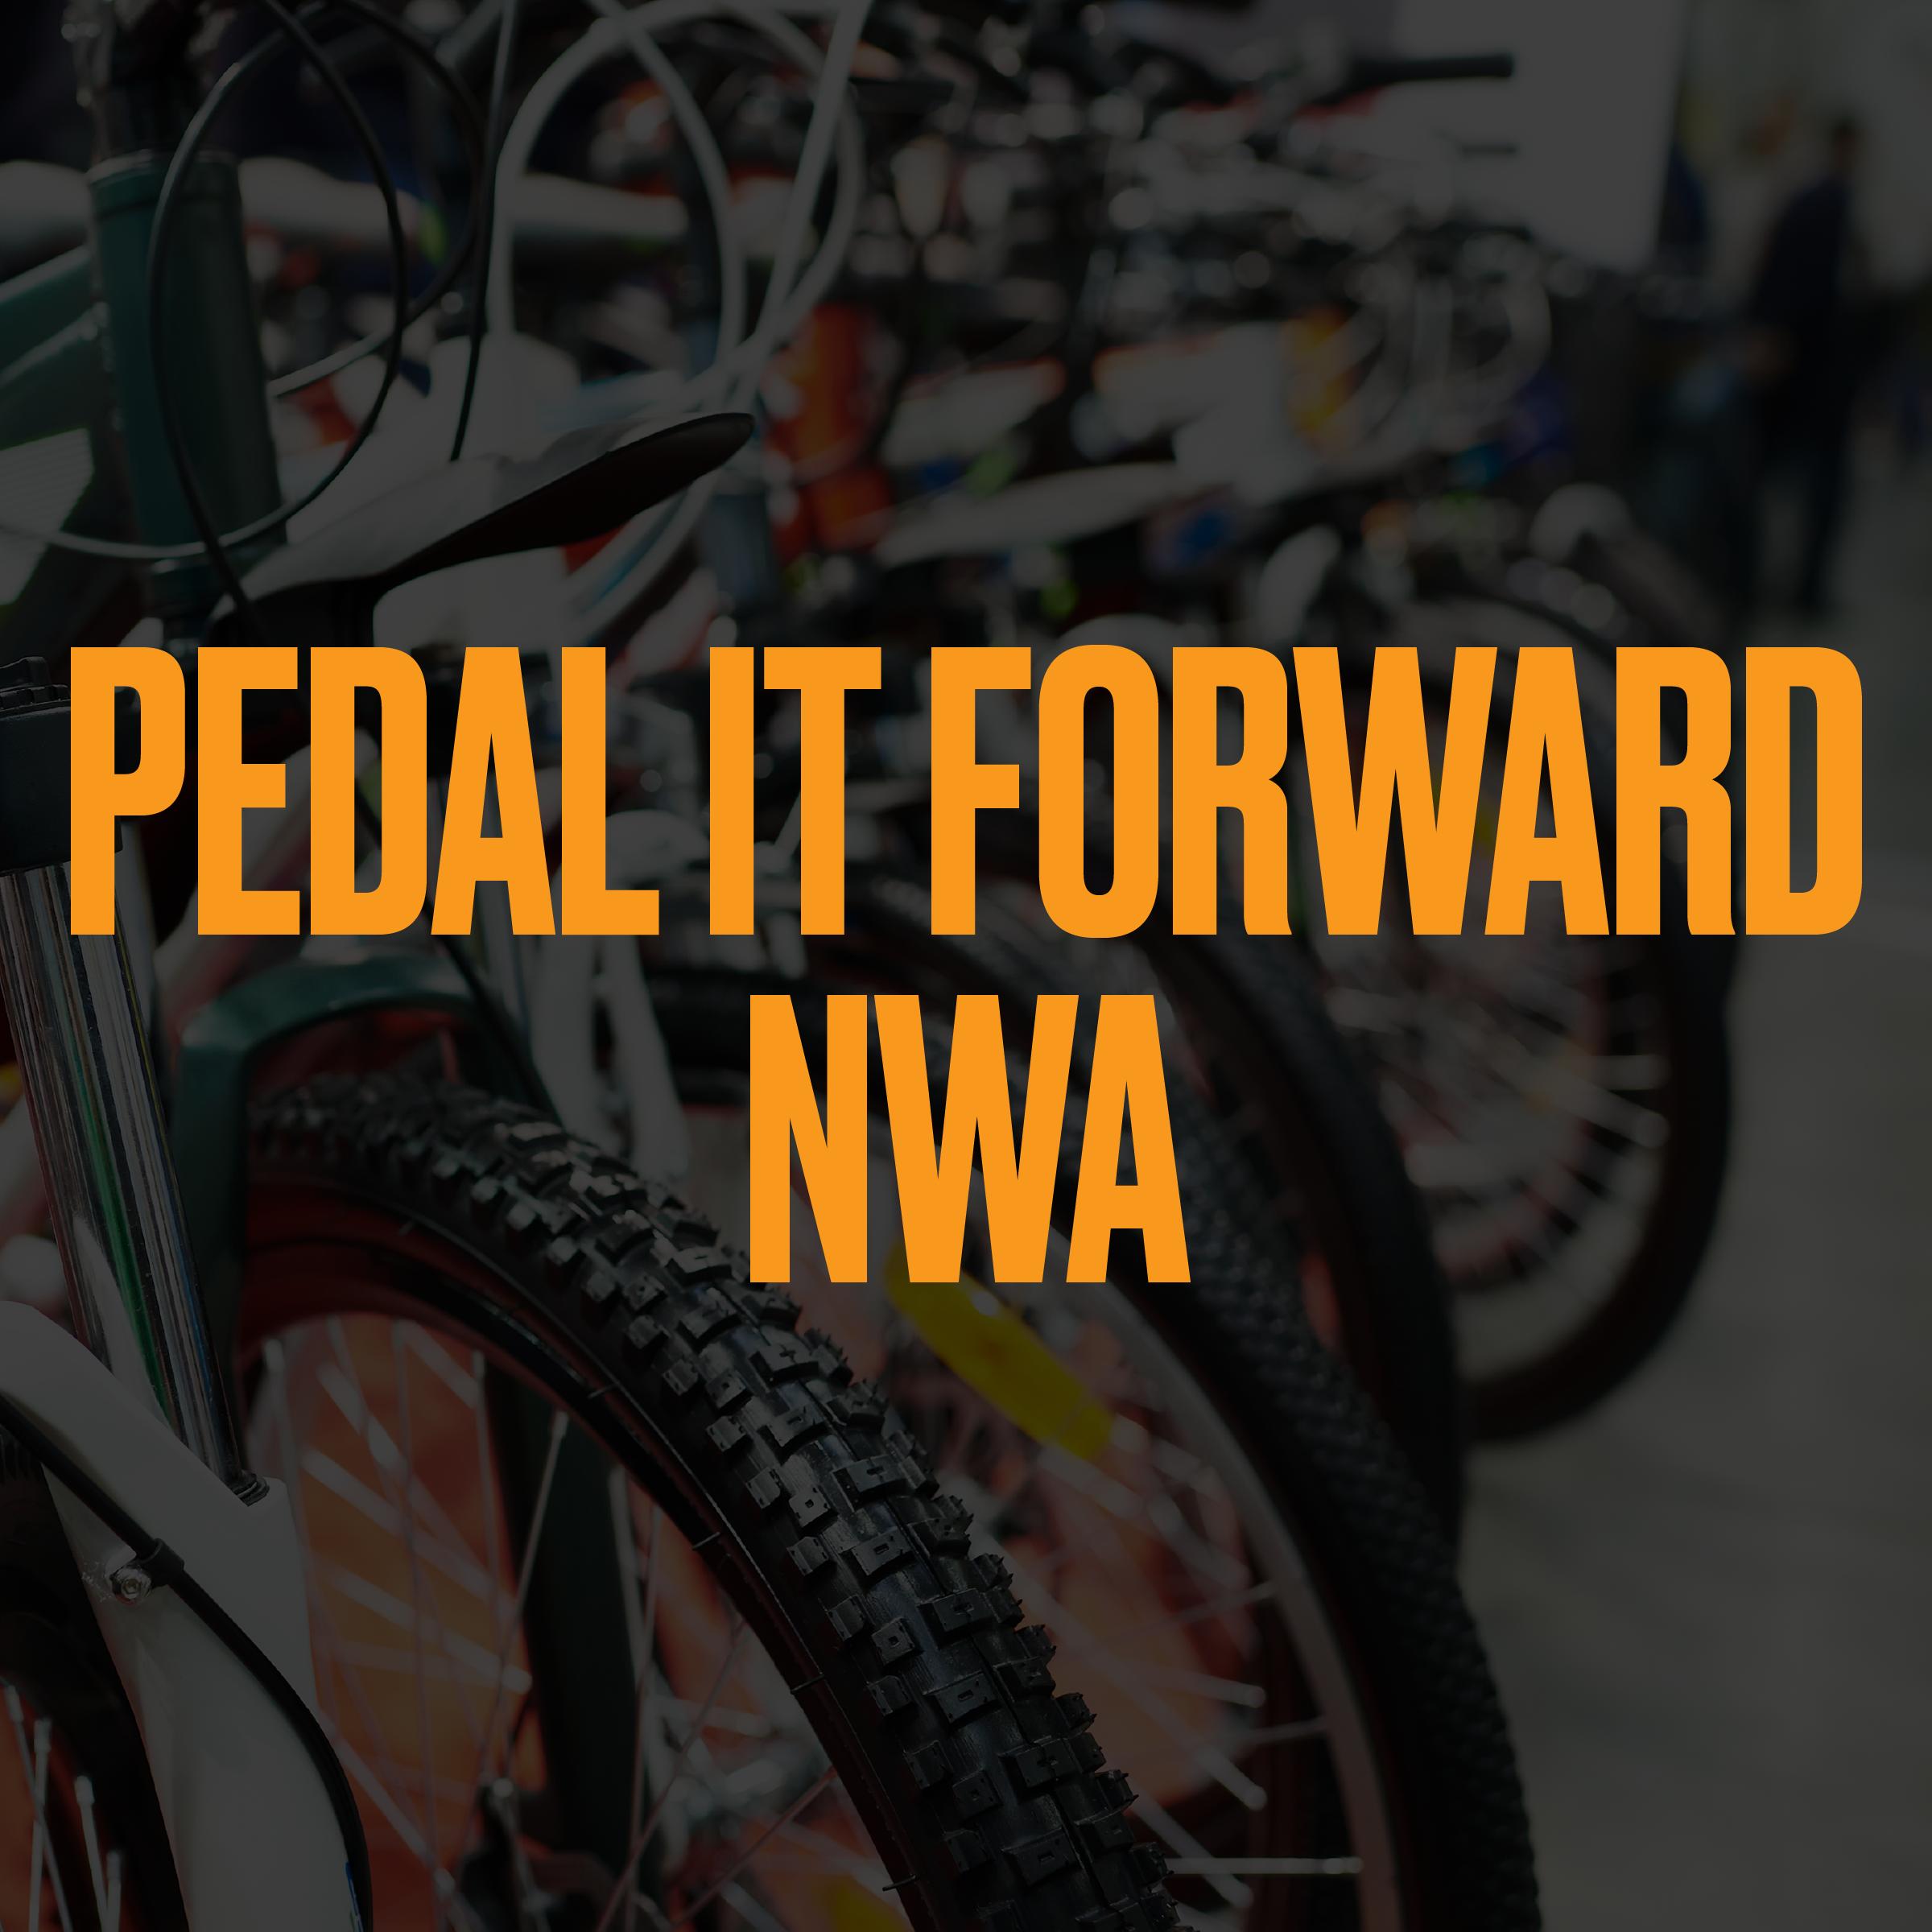 Pedal It Forward thumbnail.png